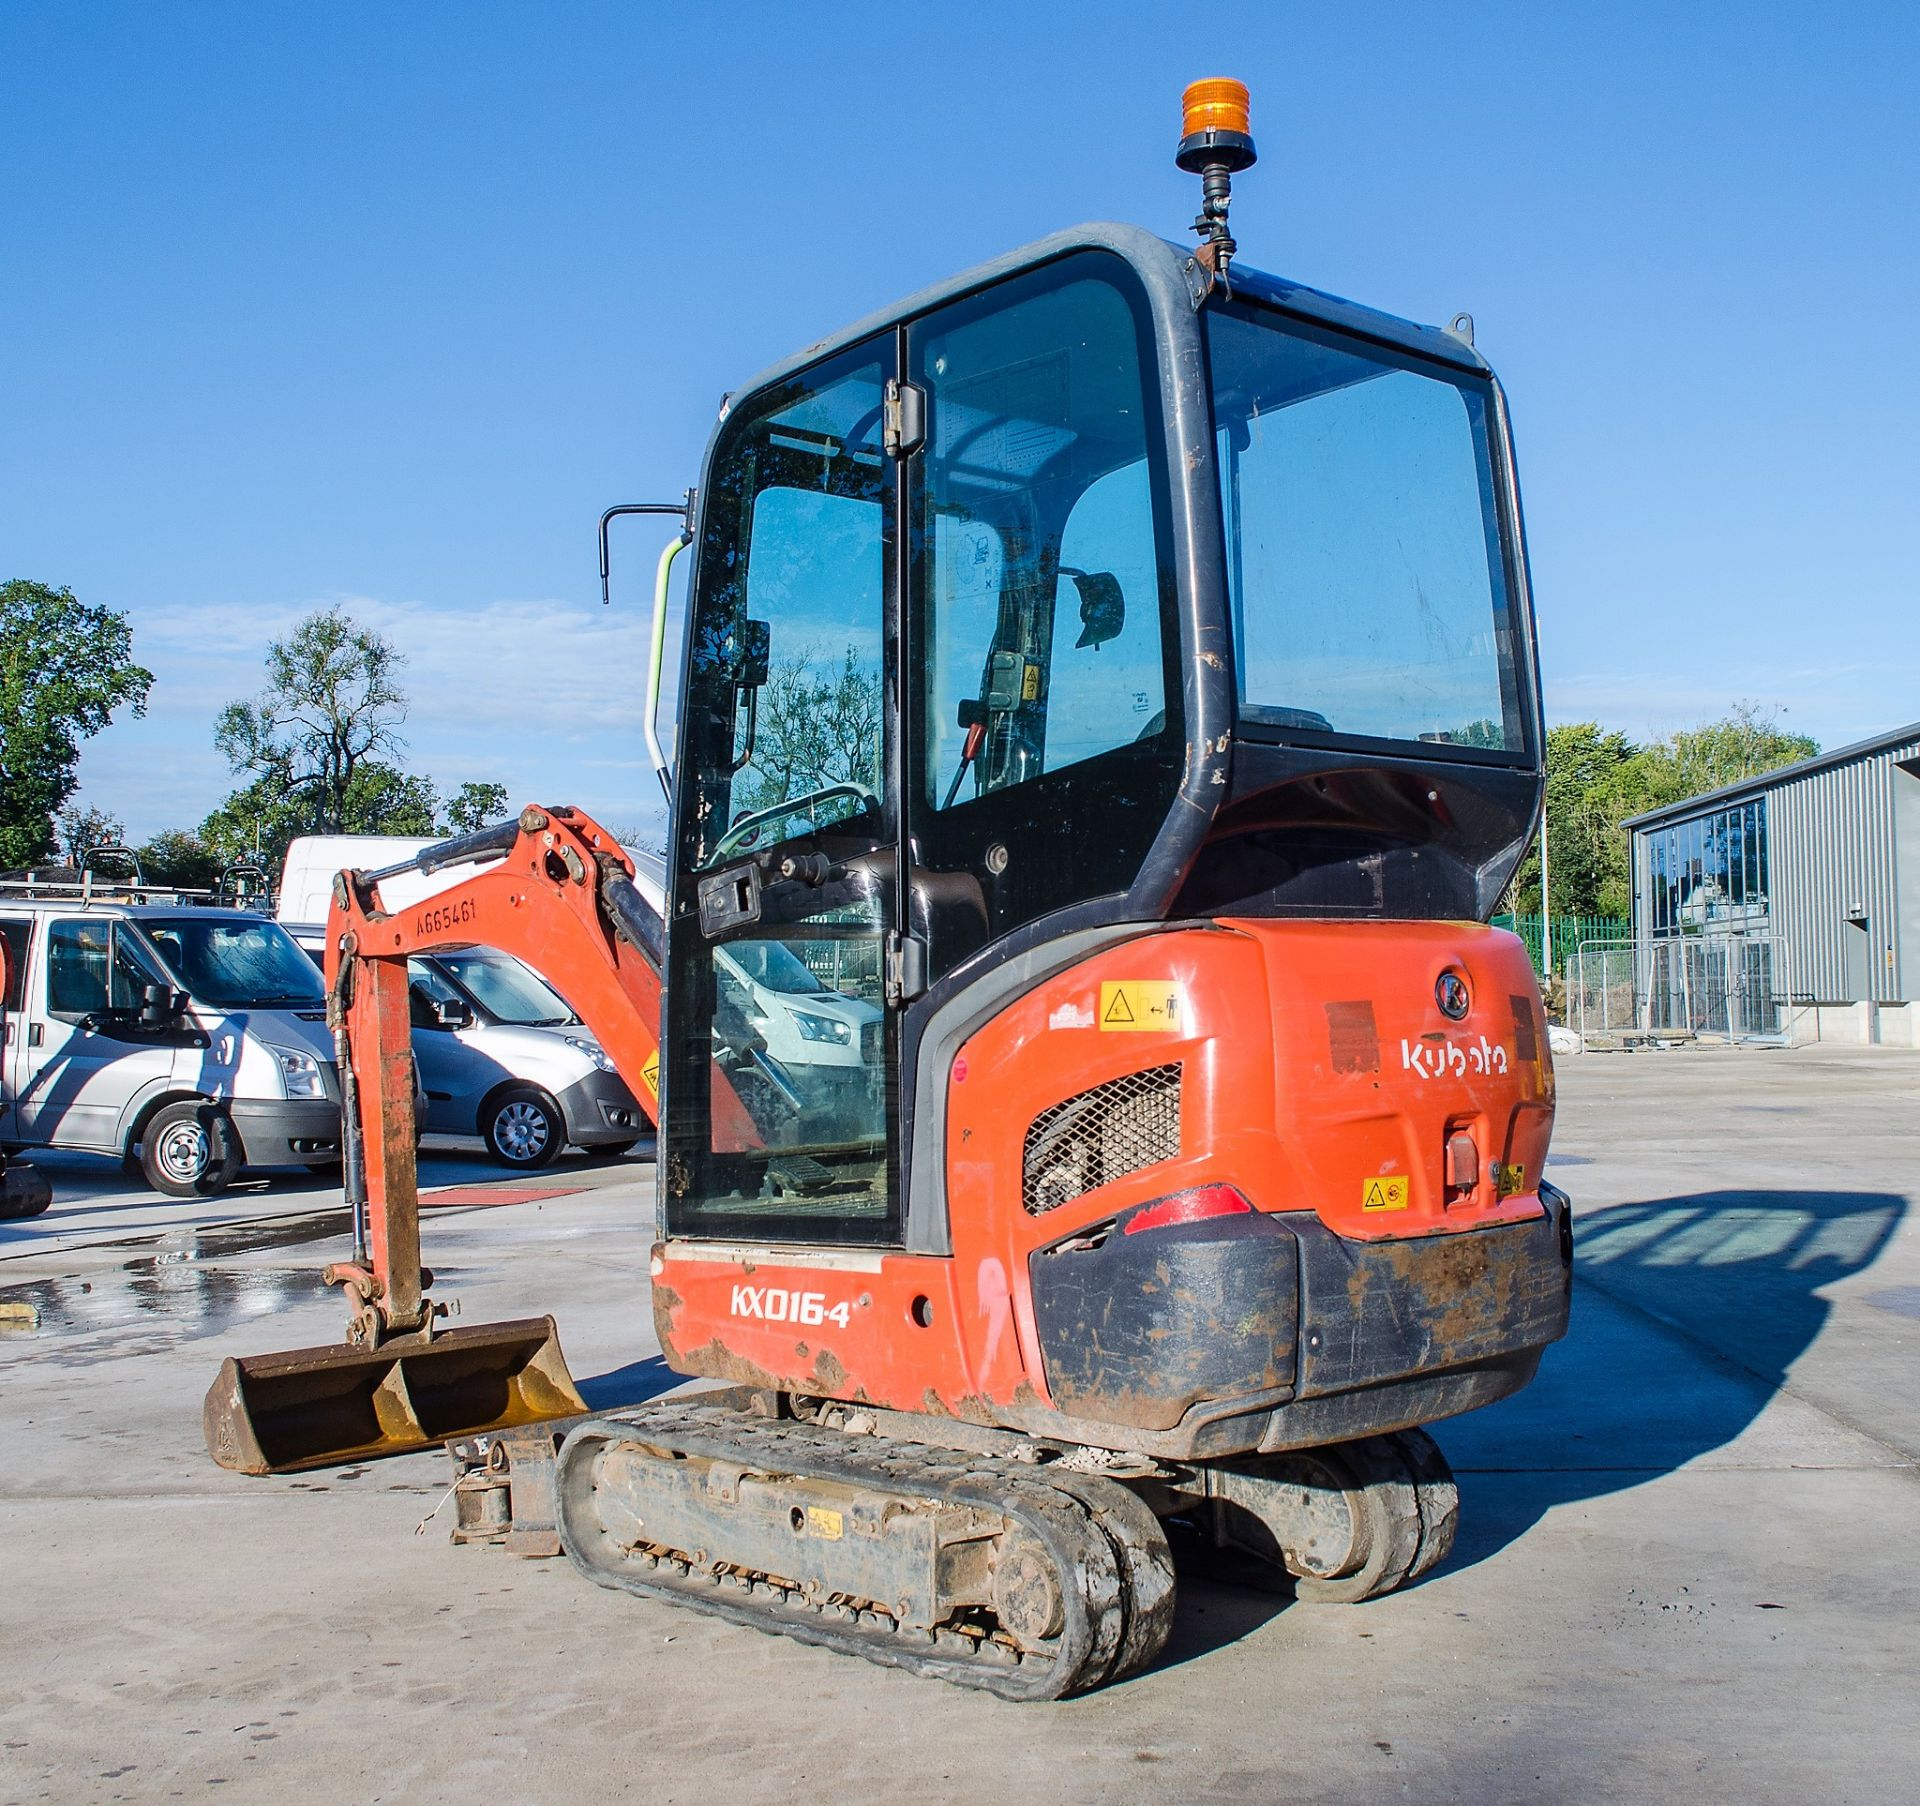 Kubota KX016-4 1.5 tonne rubber tracked mini excavator Year: 2015 S/N: 58688 Recorded Hours: 1736 - Image 3 of 19